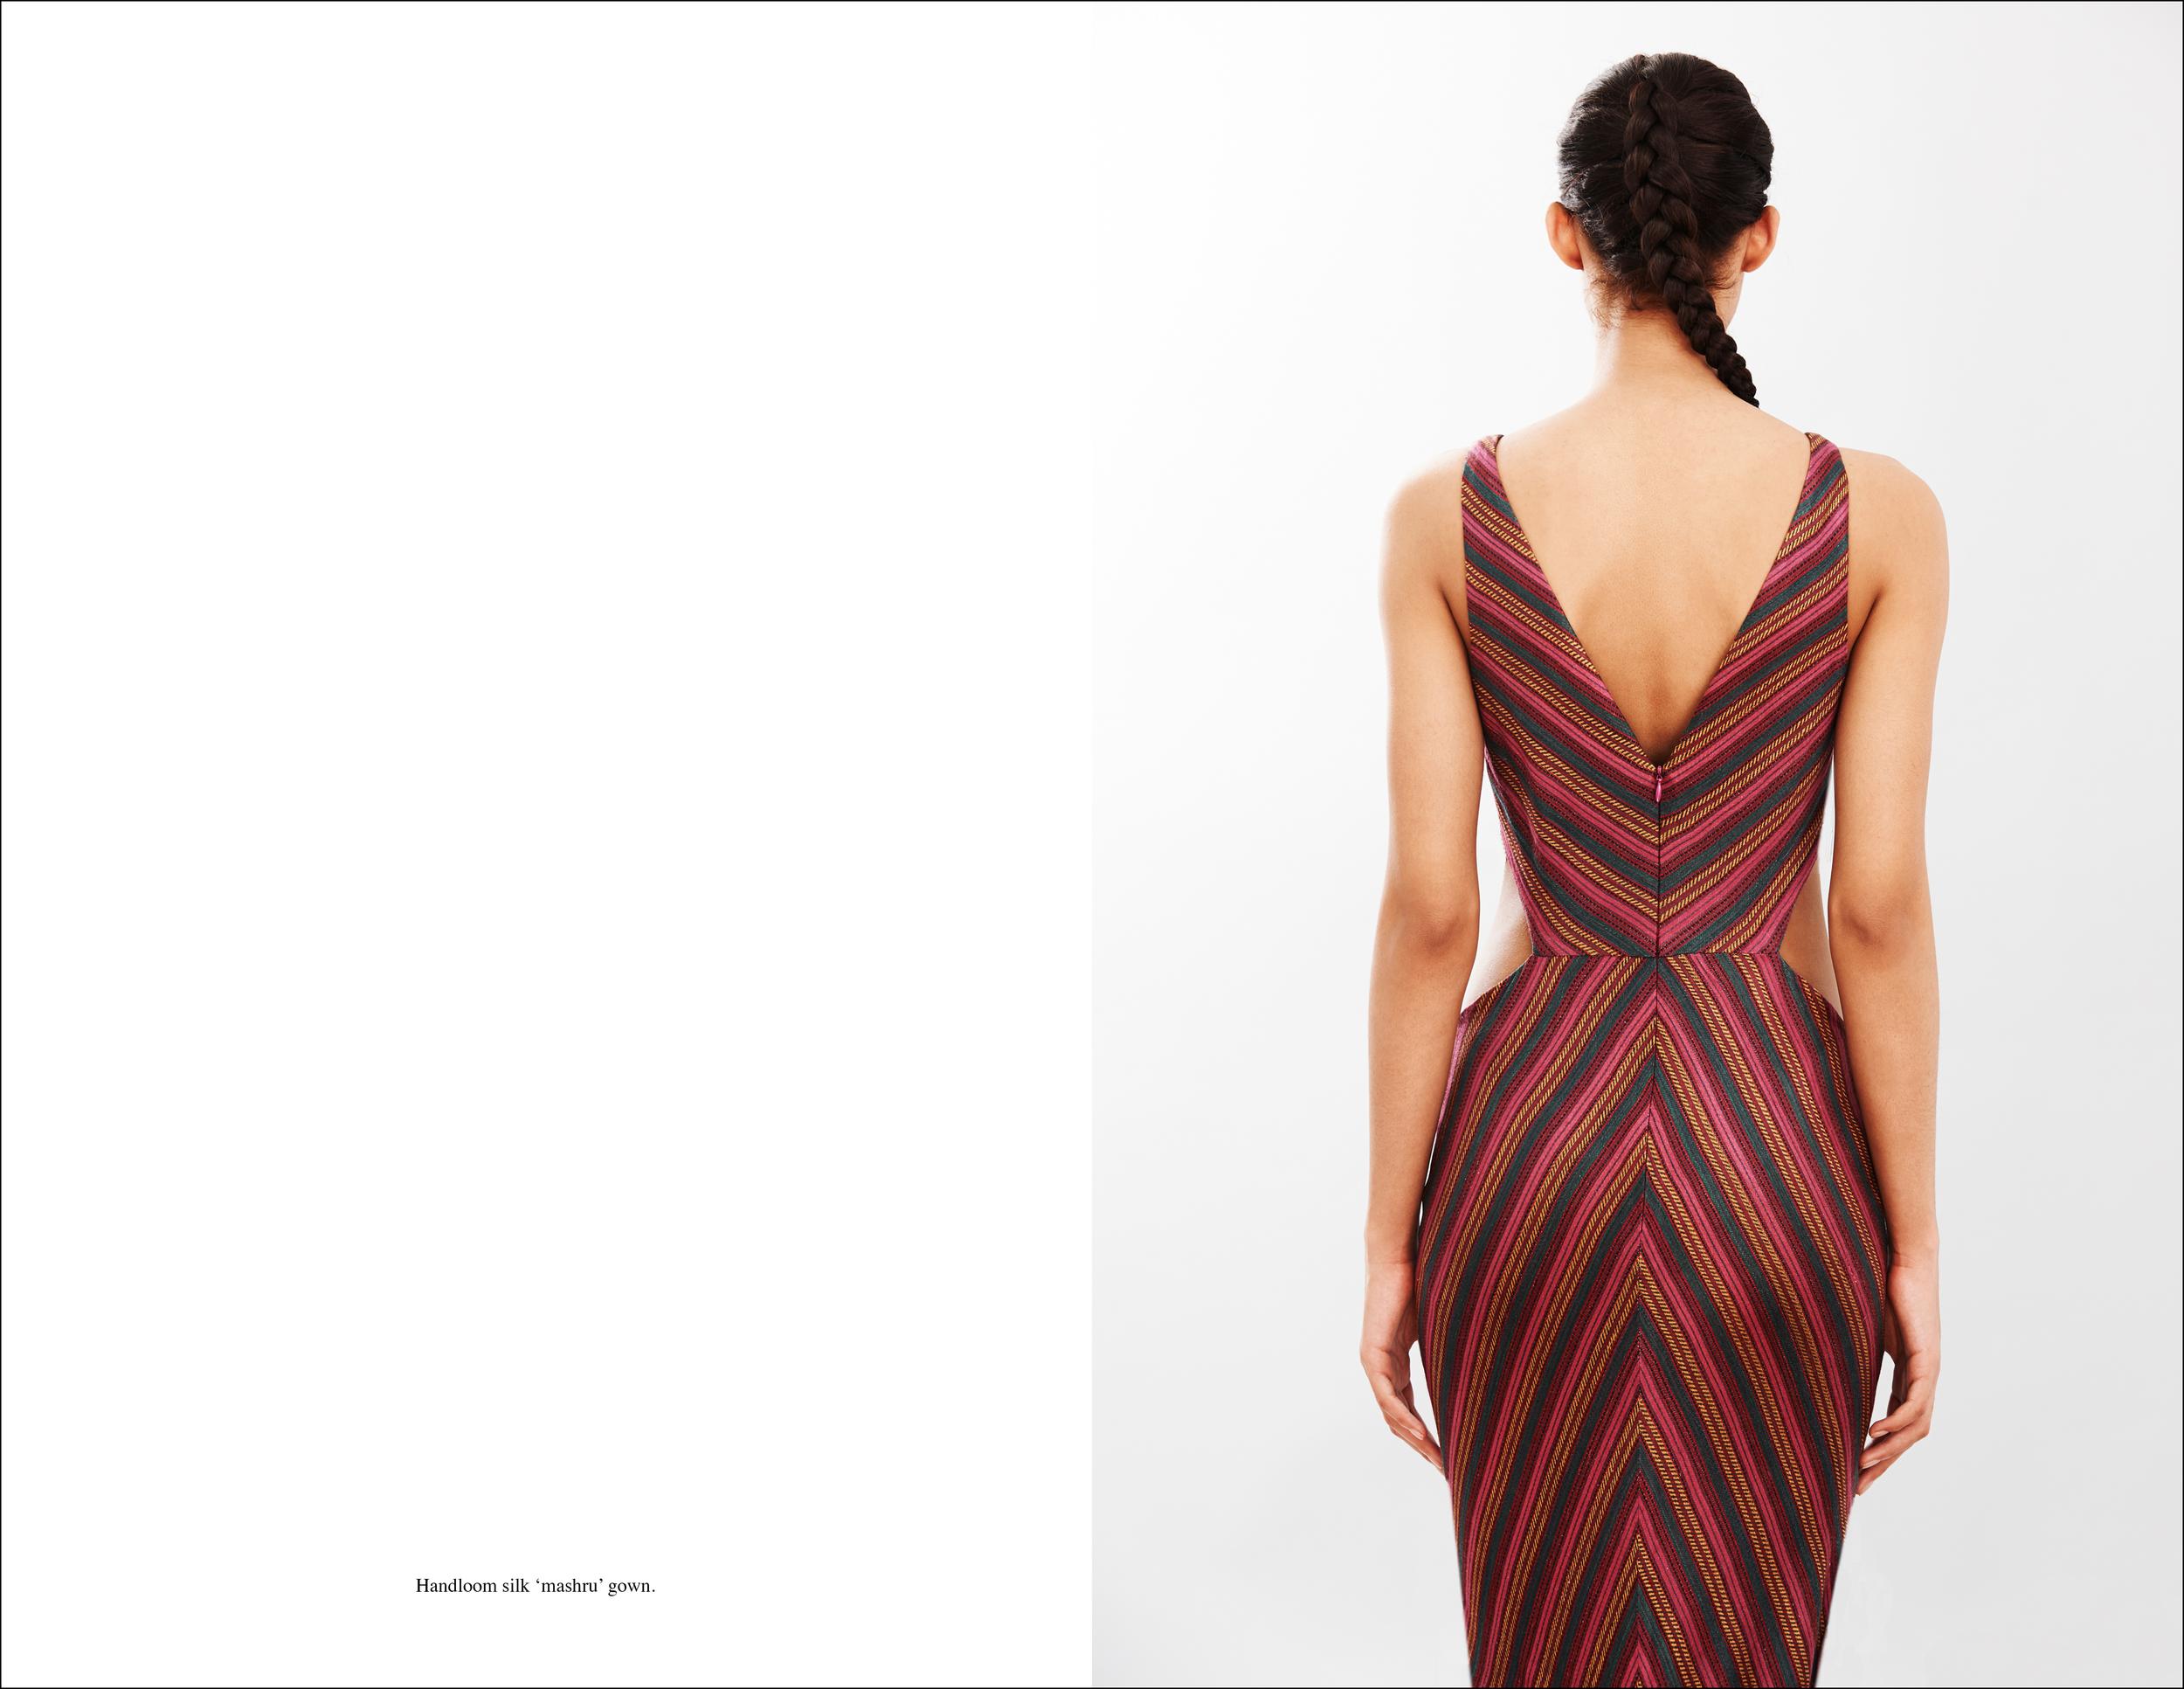 Abacaxi Handloom silk 'mashru' gown version 2 a.jpg